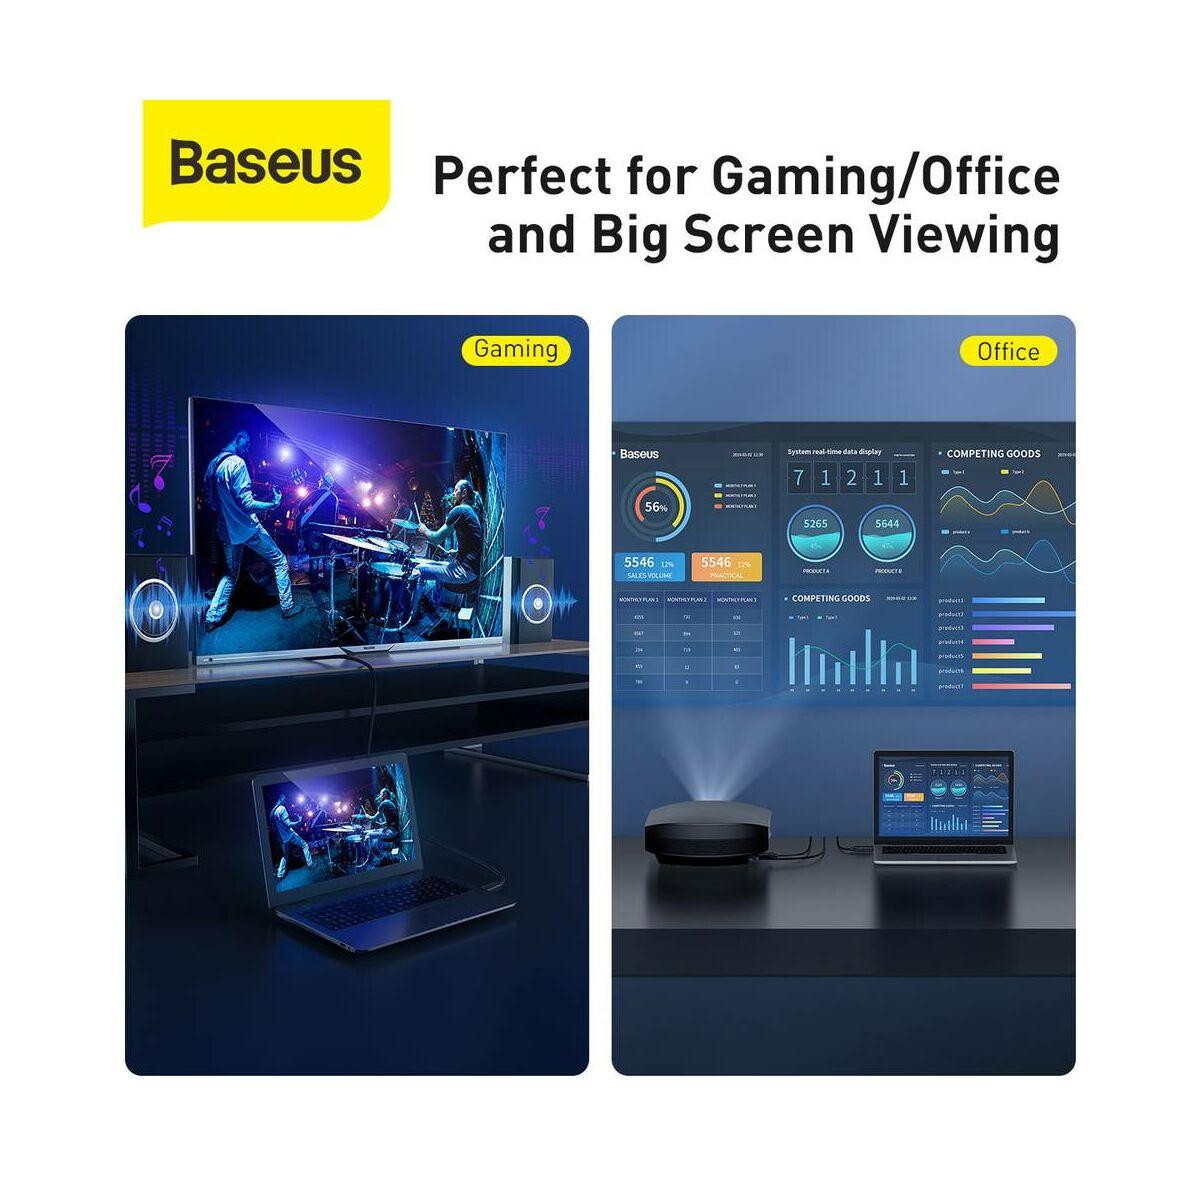 Baseus Videó kábel, High definition sorozat HDMI - 4K HDMI 12m, fekete (CAKGQ-G01)